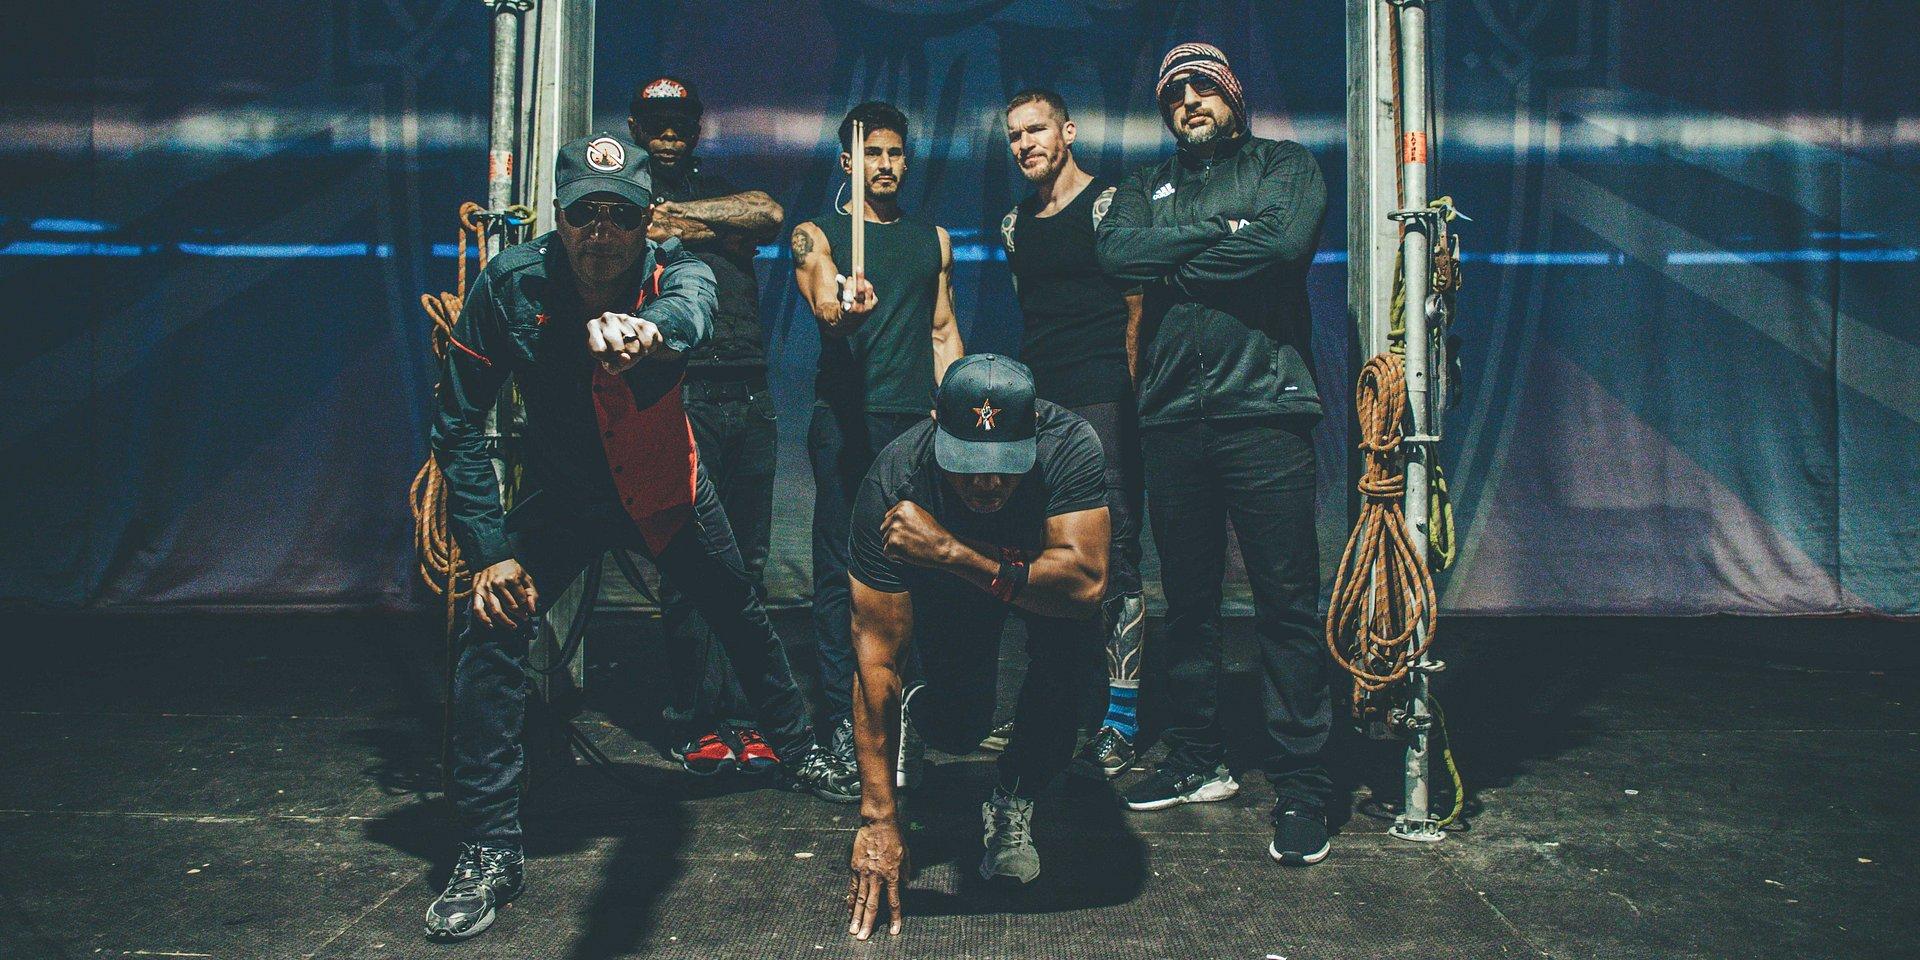 Amerykańska supergrupa Prophets Of Rage na tegorocznym Pol'and'Rock Festival!